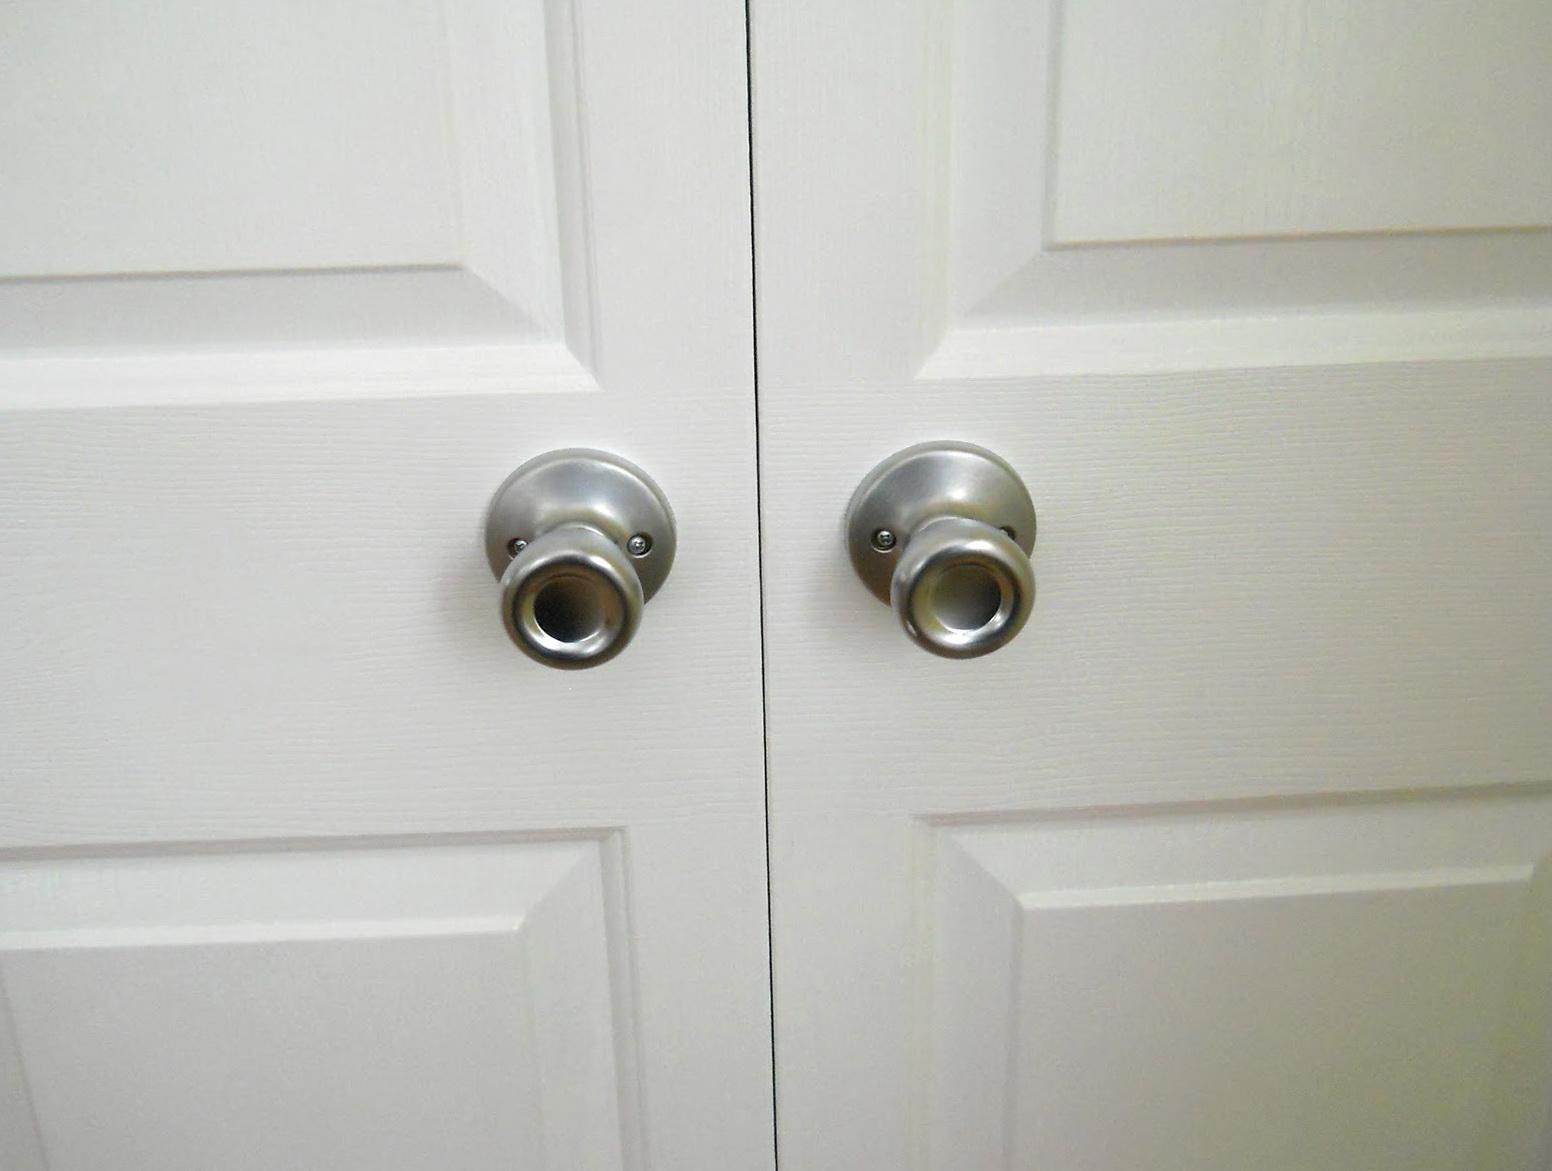 Bifold Closet Doors Knob Placement Home Design Ideas